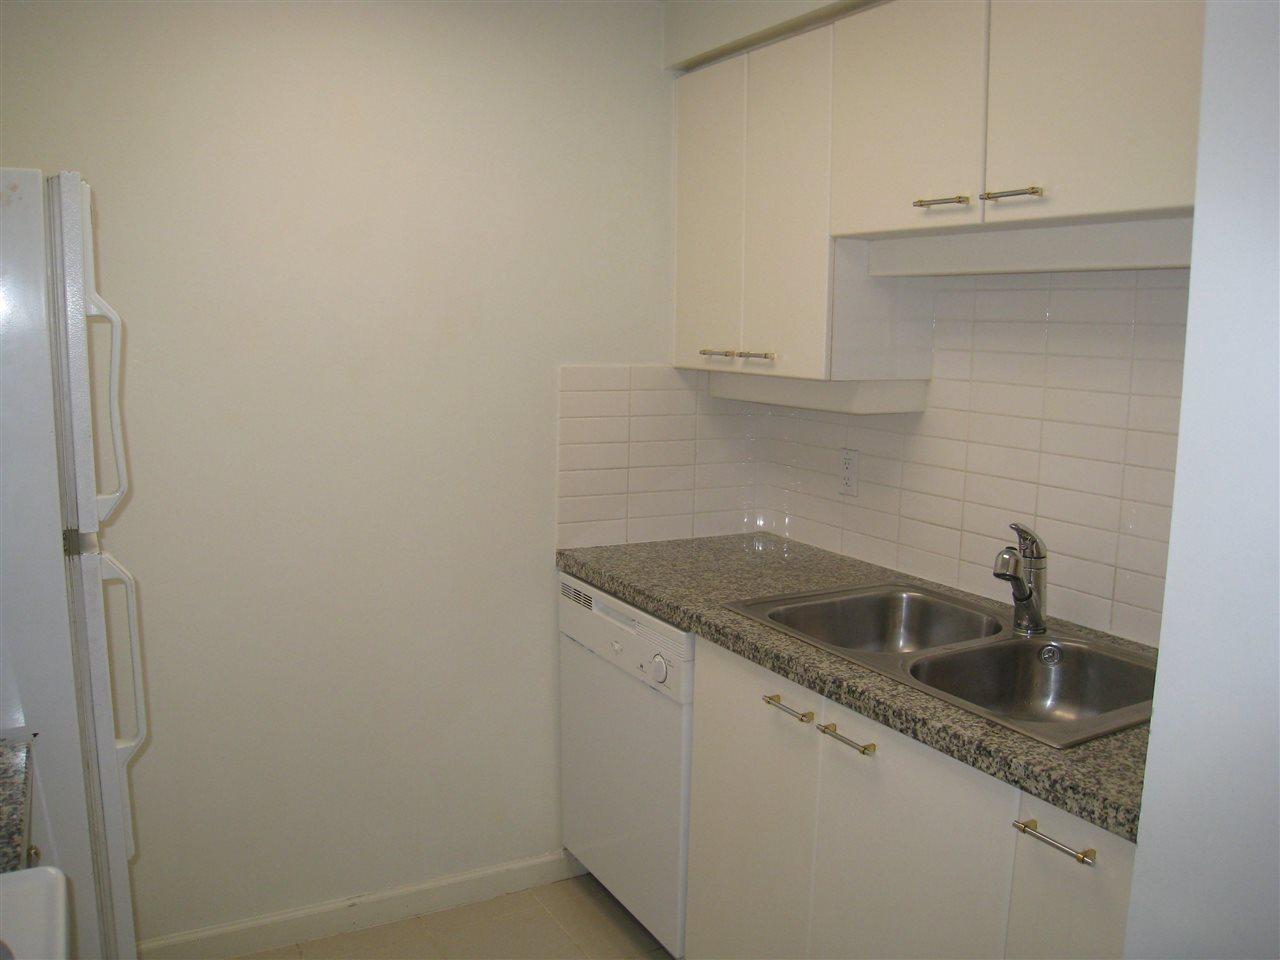 Condo Apartment at 1305 388 DRAKE STREET, Unit 1305, Vancouver West, British Columbia. Image 5